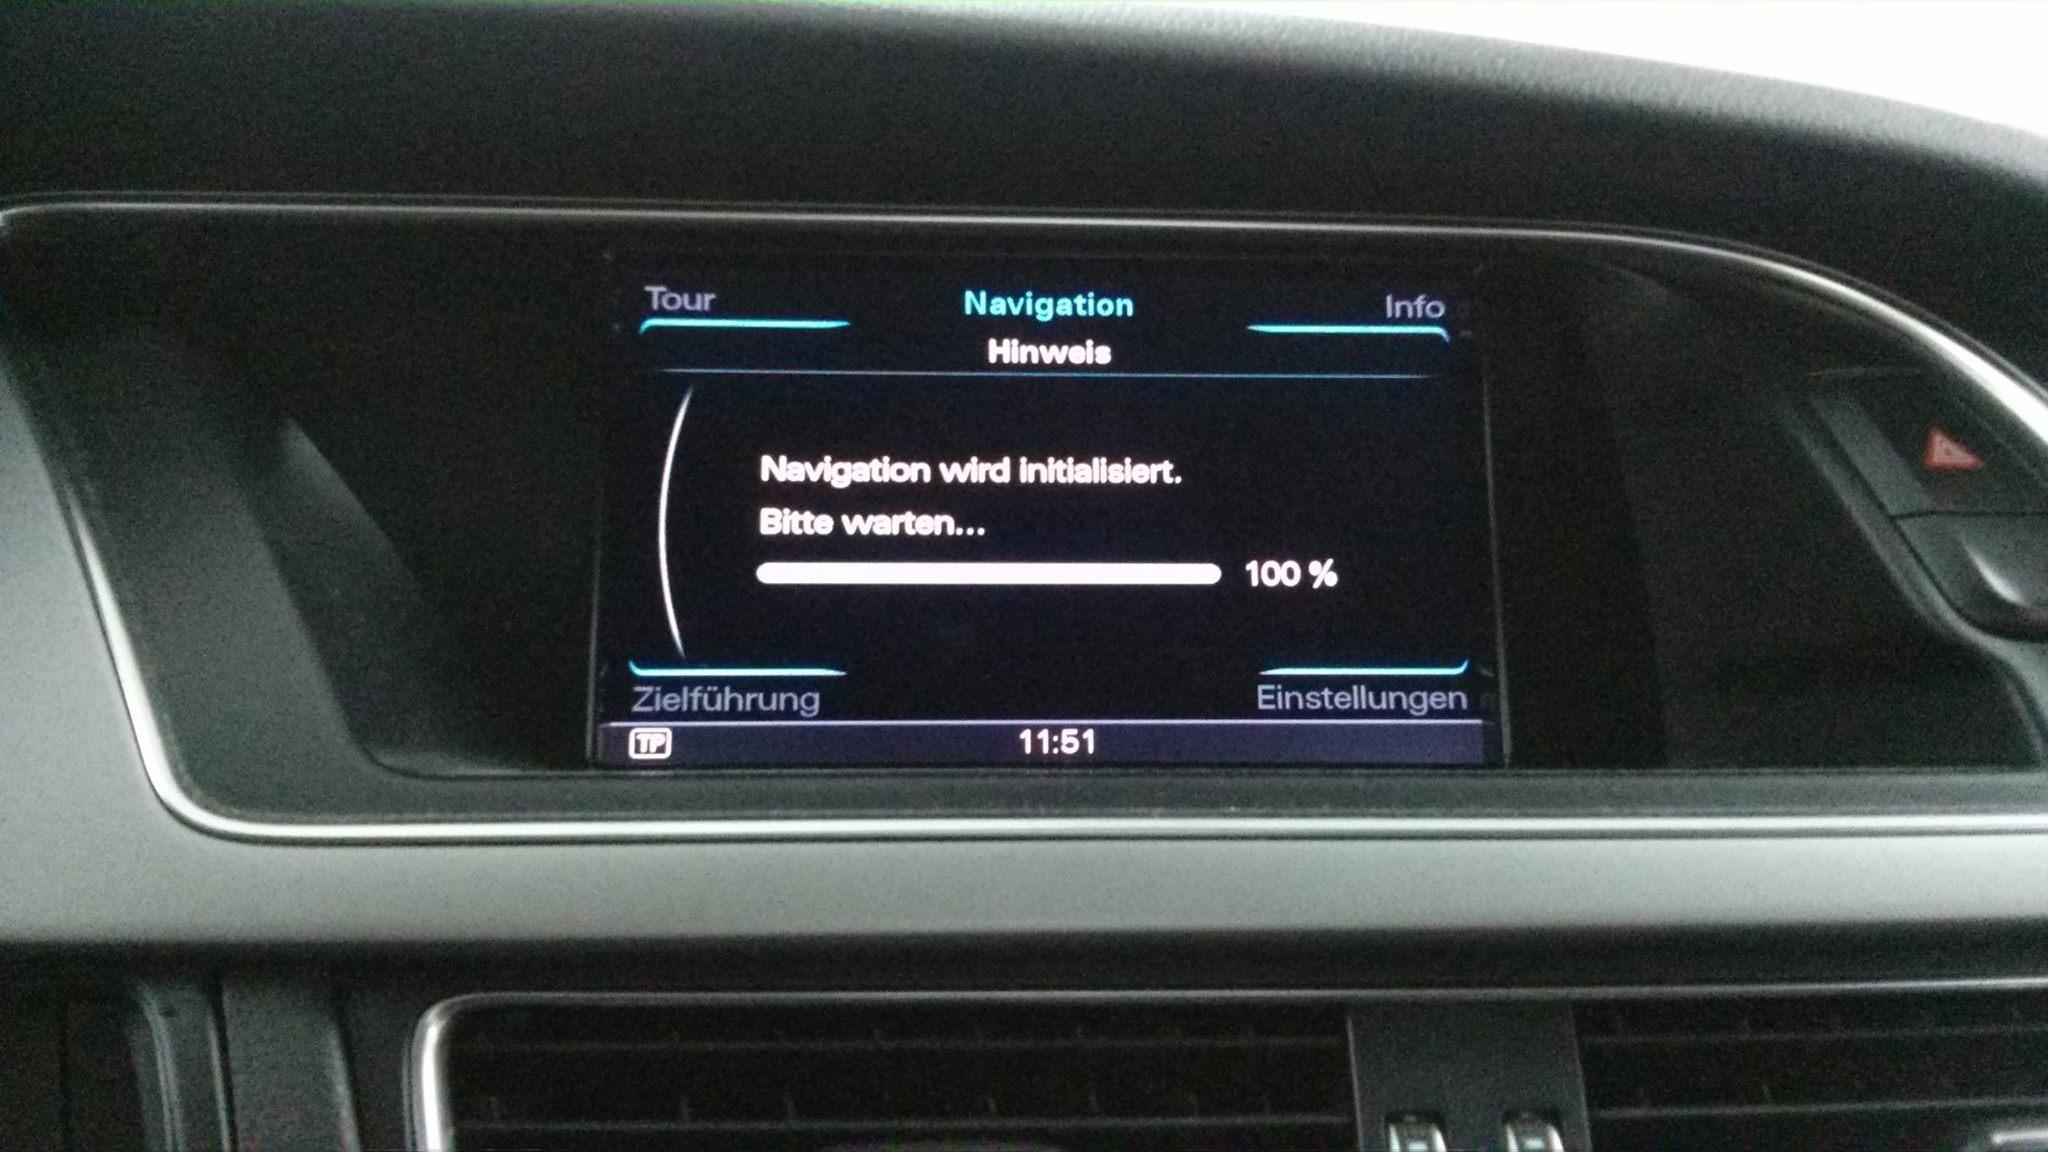 AUDI A5 SPORTBACK 2.0 TDI QUATTRO 2012